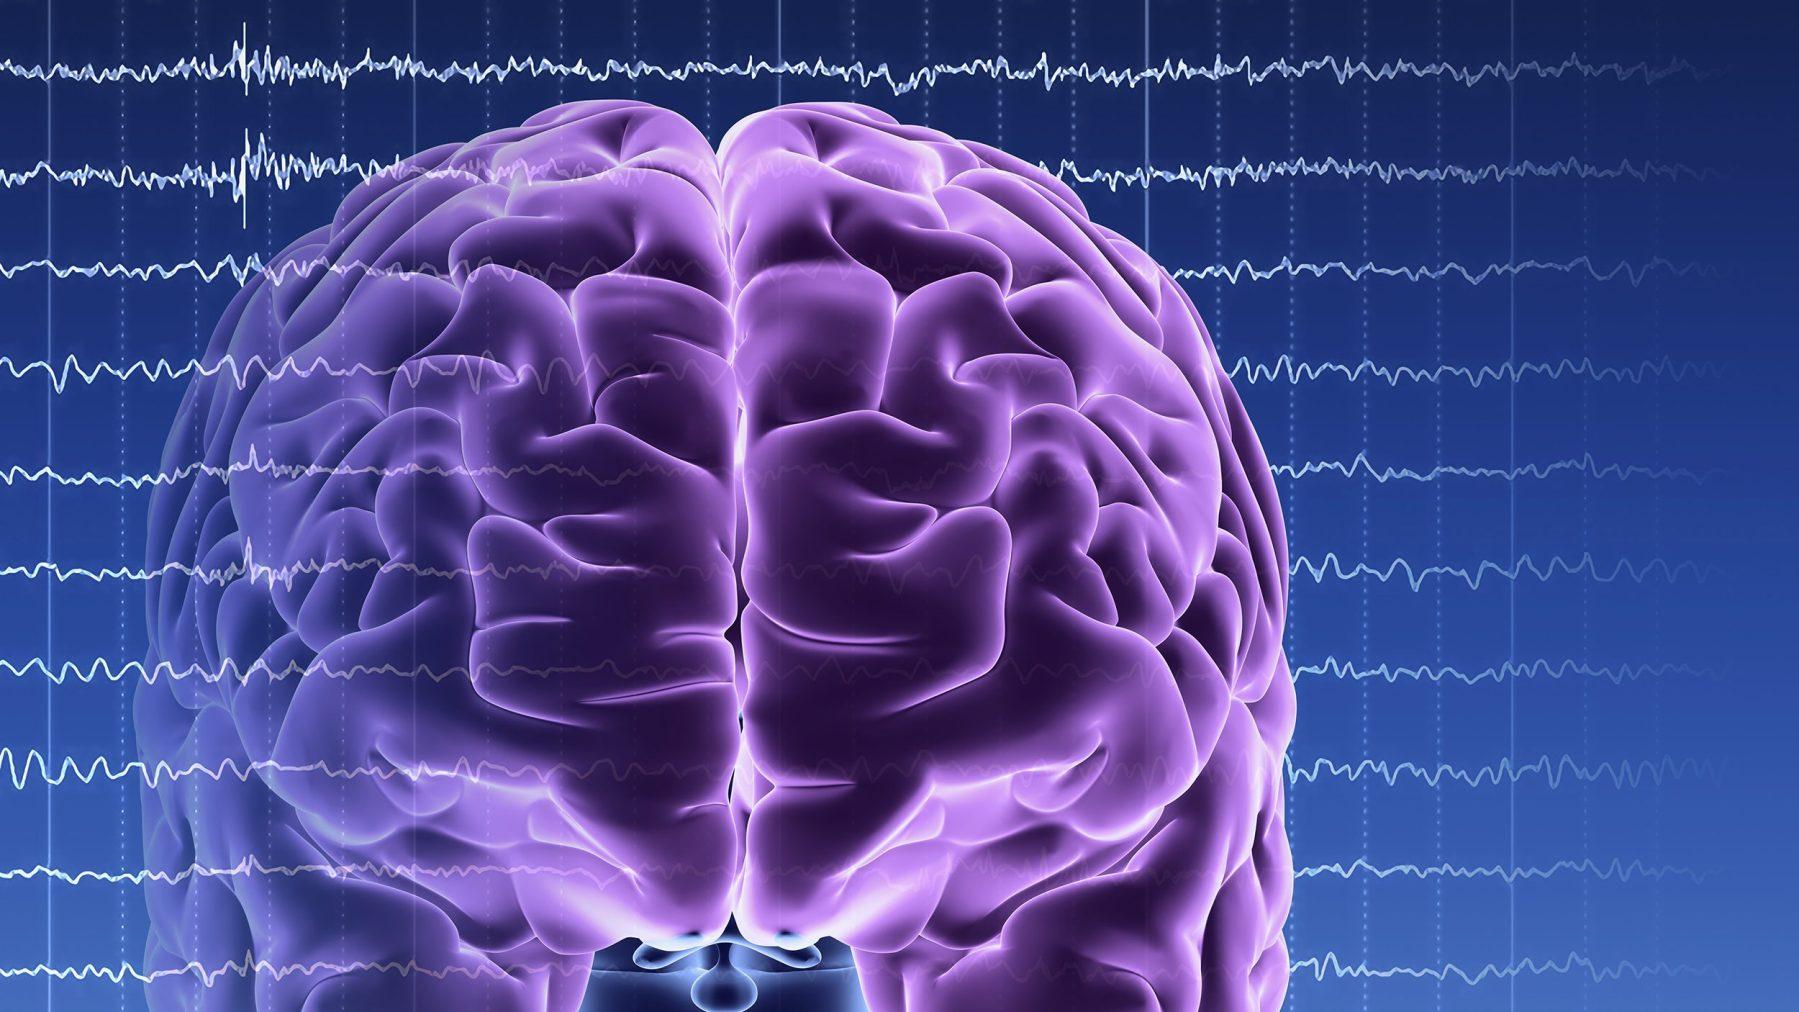 Brain activity. Computer artwork of EEG (electroencephalogram) traces superimposed over a brain illustration. An EEG records the brain's activity.